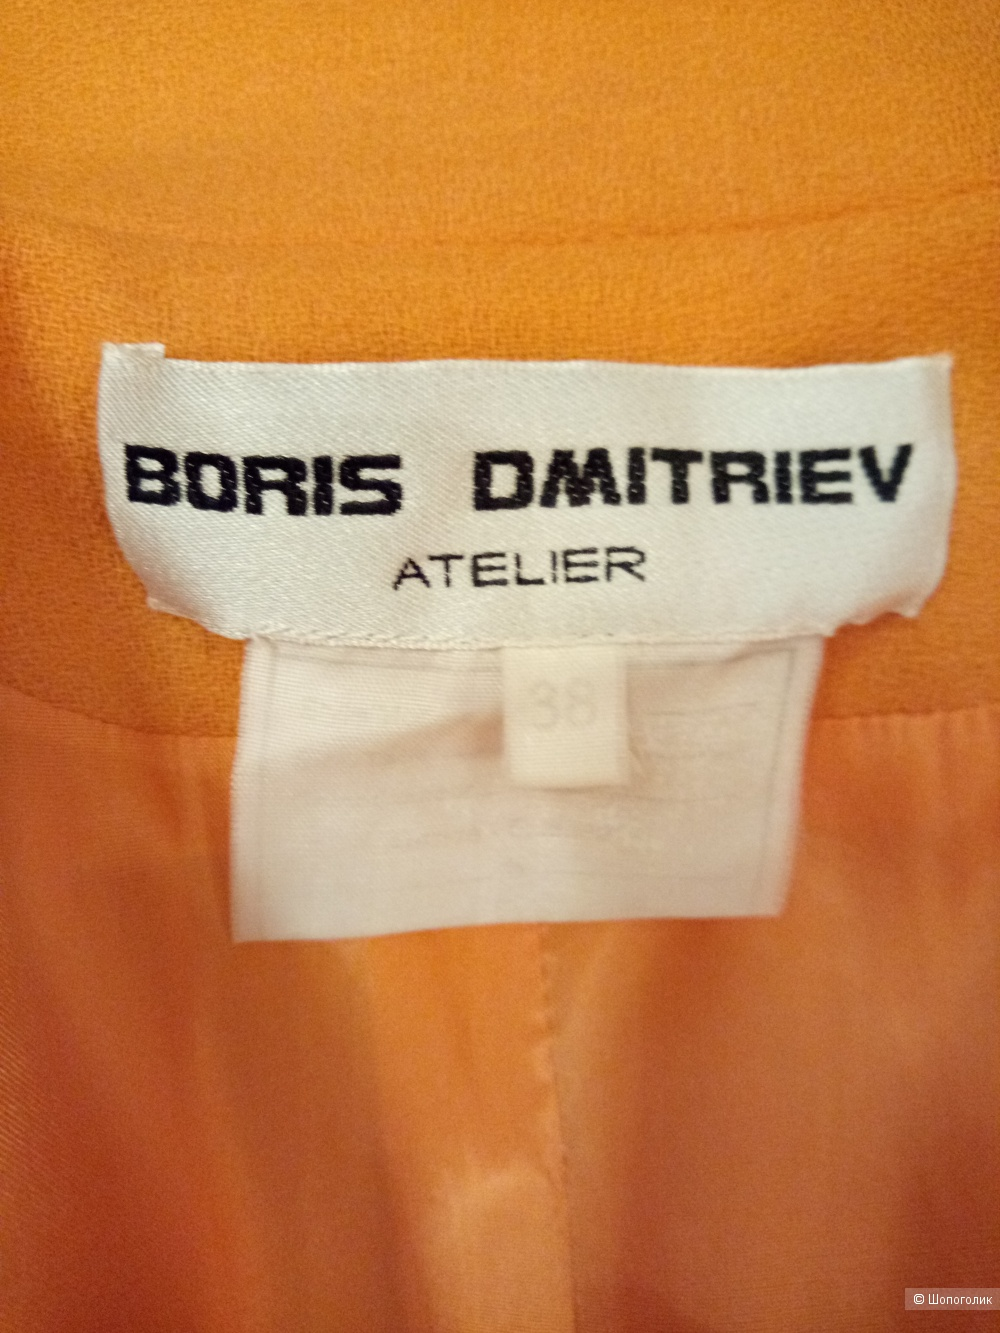 Костюм Boris Dmitriev atelier + подарок, размер 46 рос